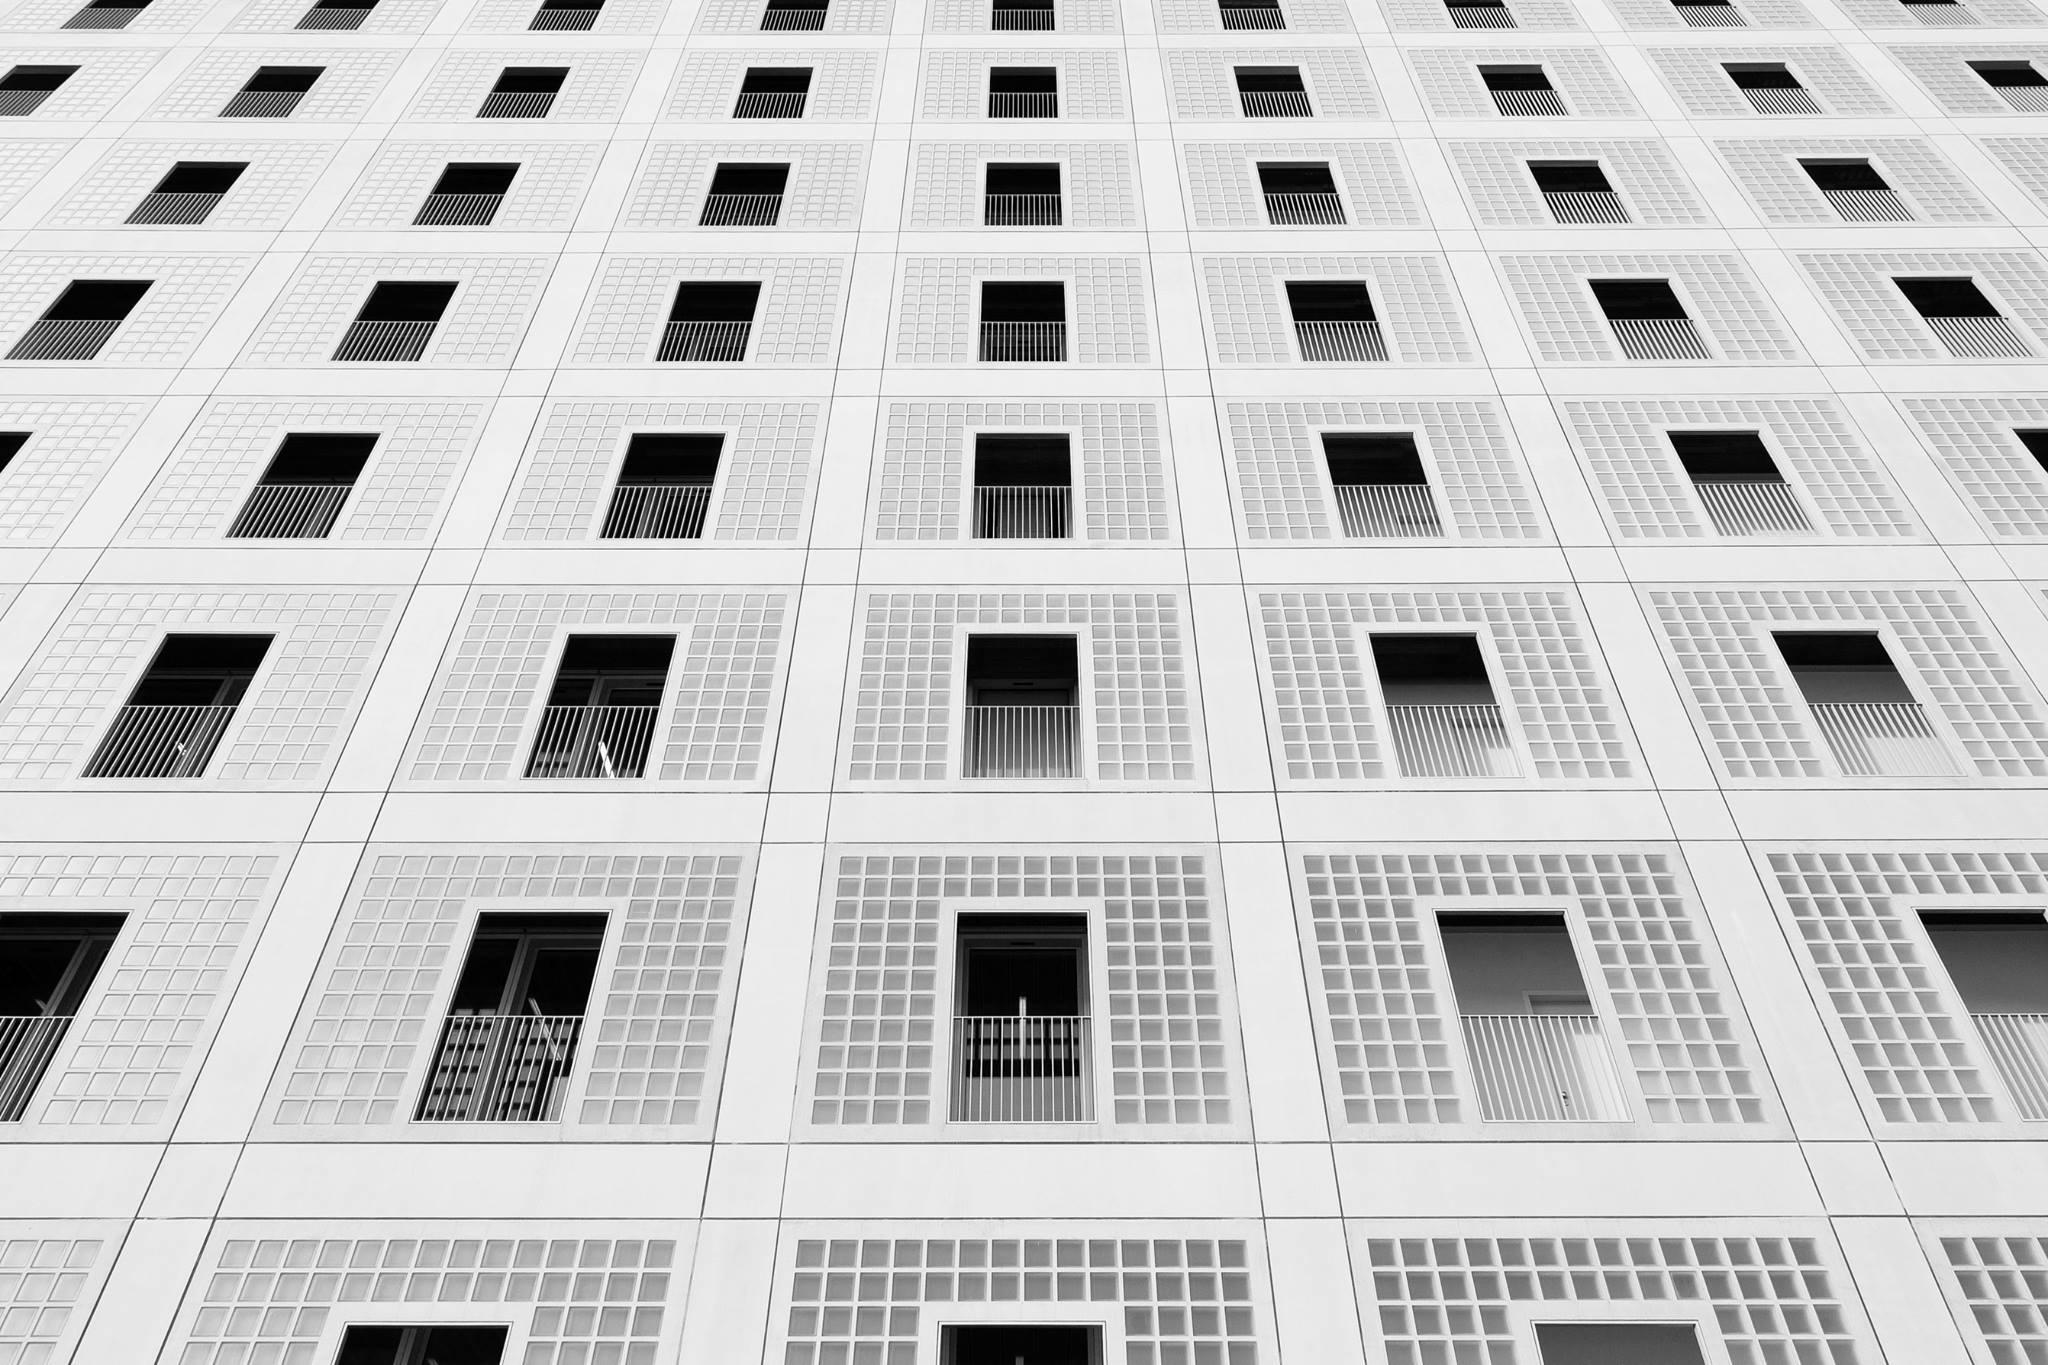 kevin-krautgartner-architecture-photography-07